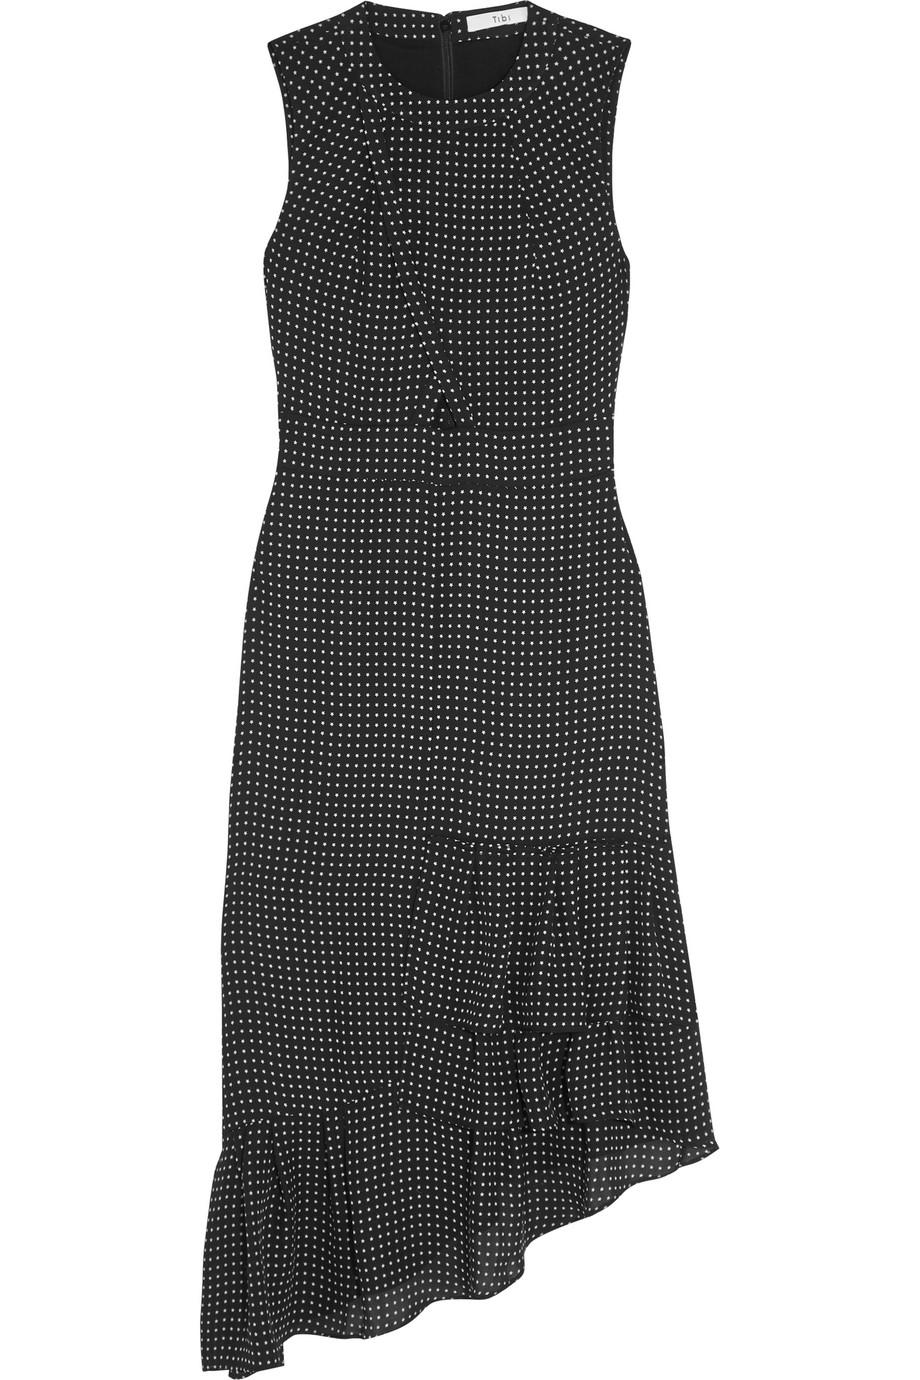 Tibi Estrella Ruffled Printed Silk Midi Dress, Black, Women's - Printed, Size: 10